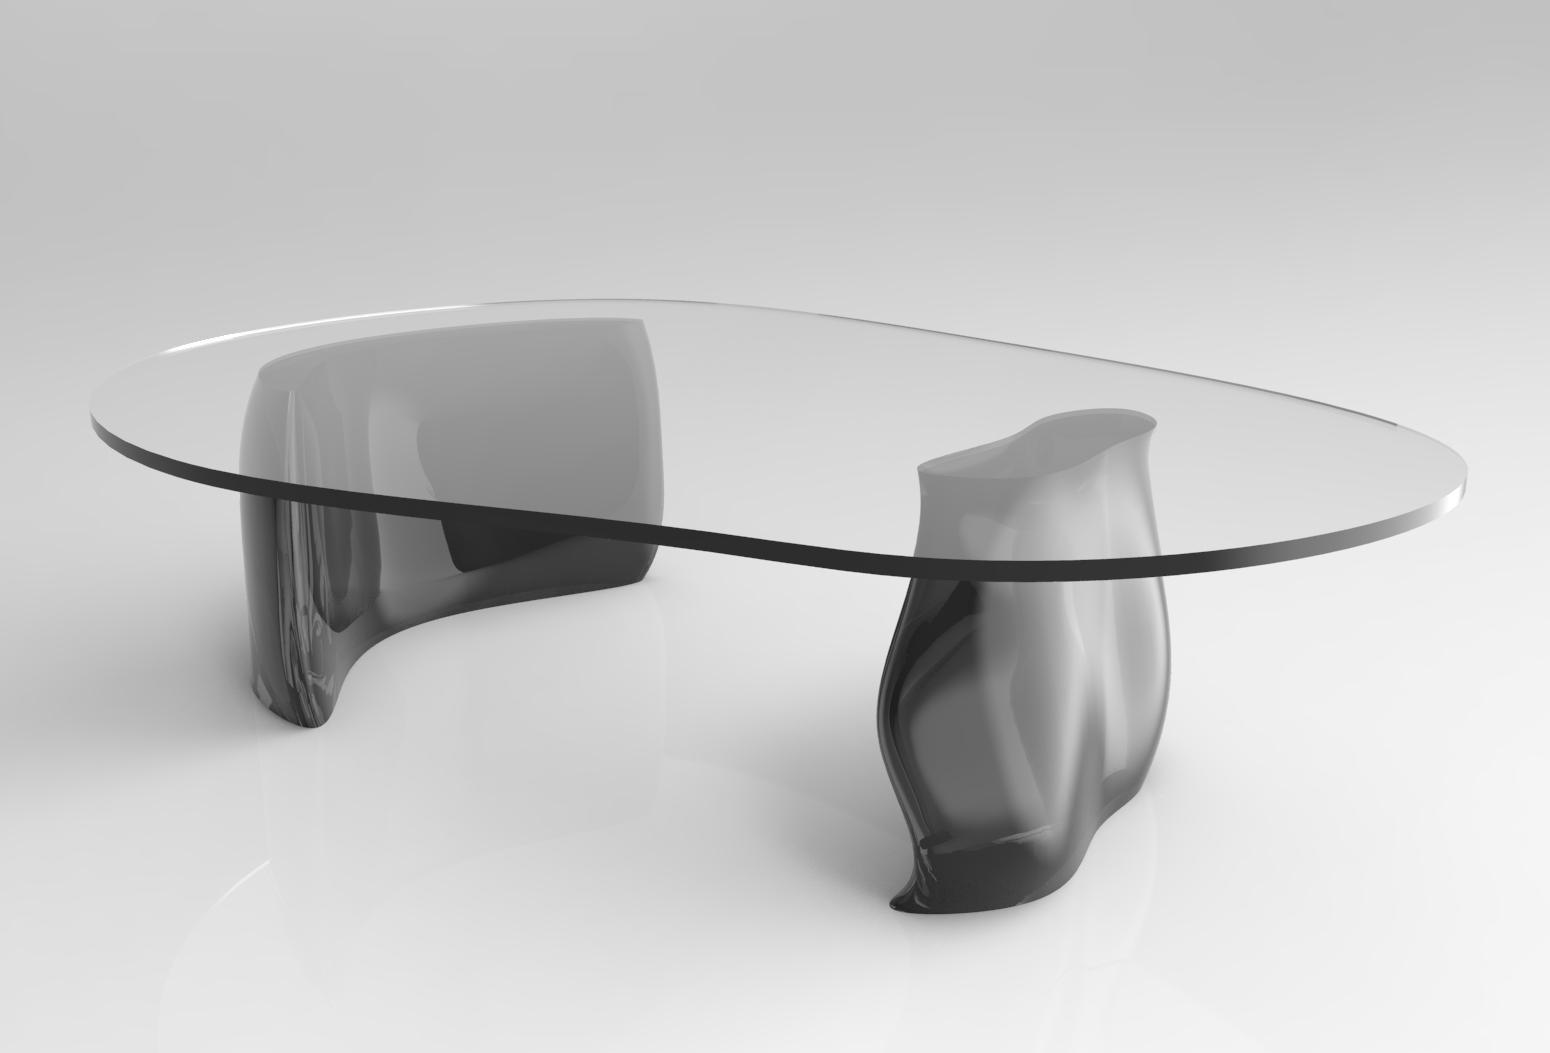 thinking architects ARCHITEKT Jakub Gwizdała projekty gotowe nowoczesny projekt domu thinking architects 0.1 table b